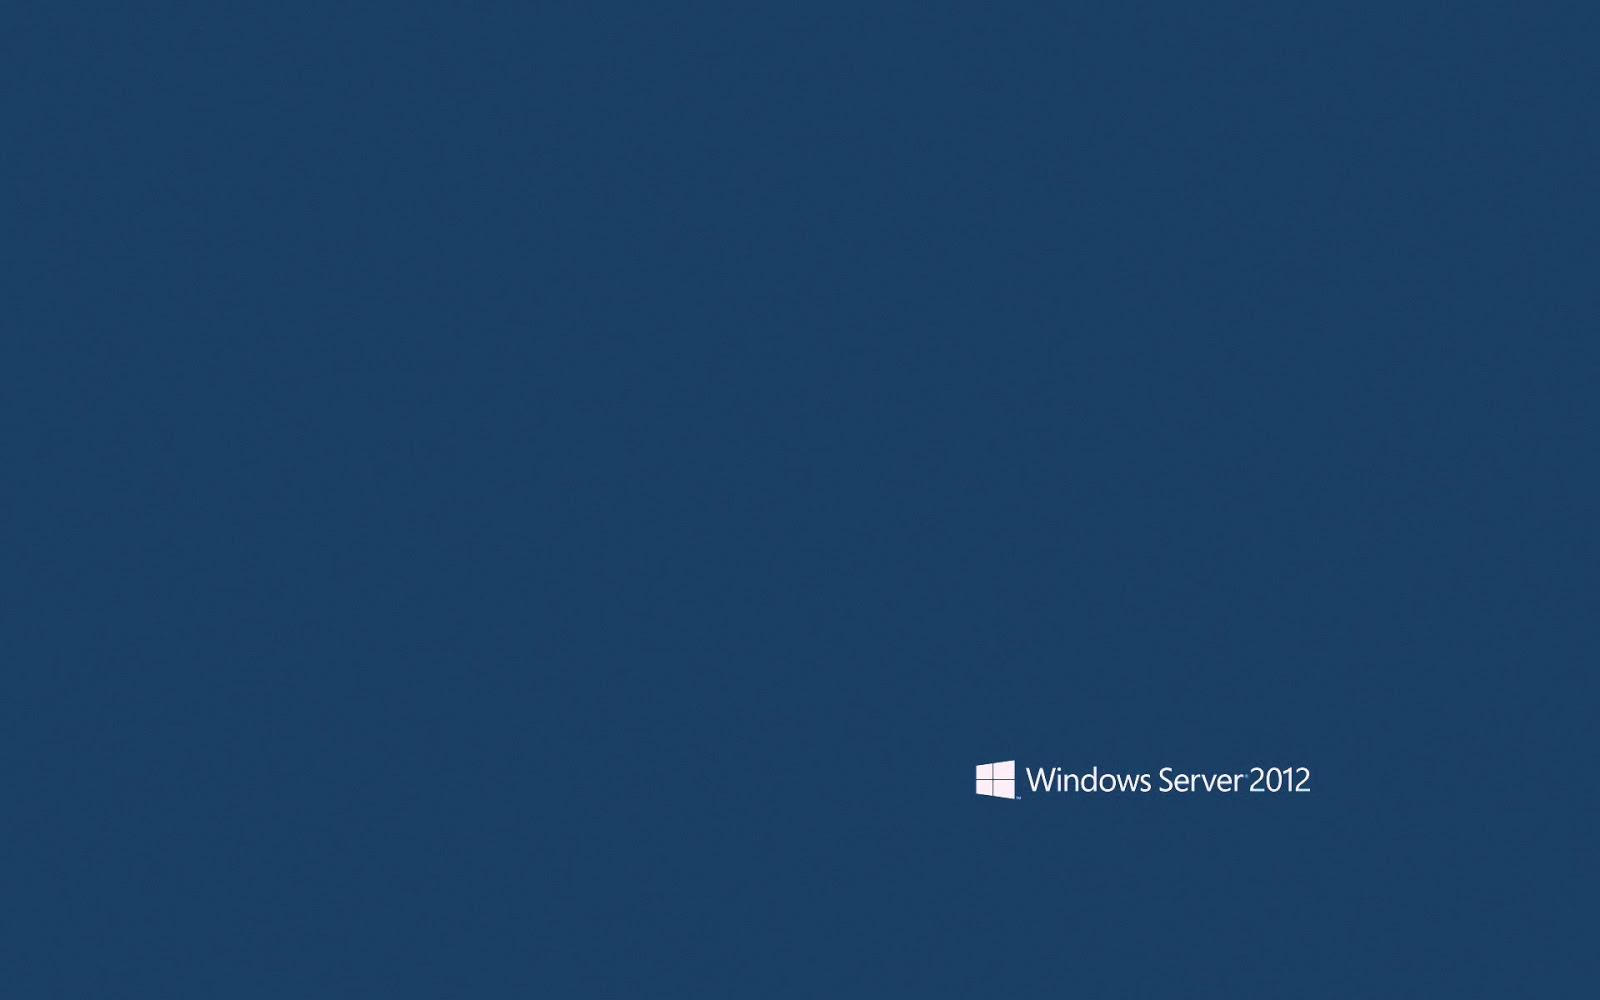 windows 10 earth - photo #41